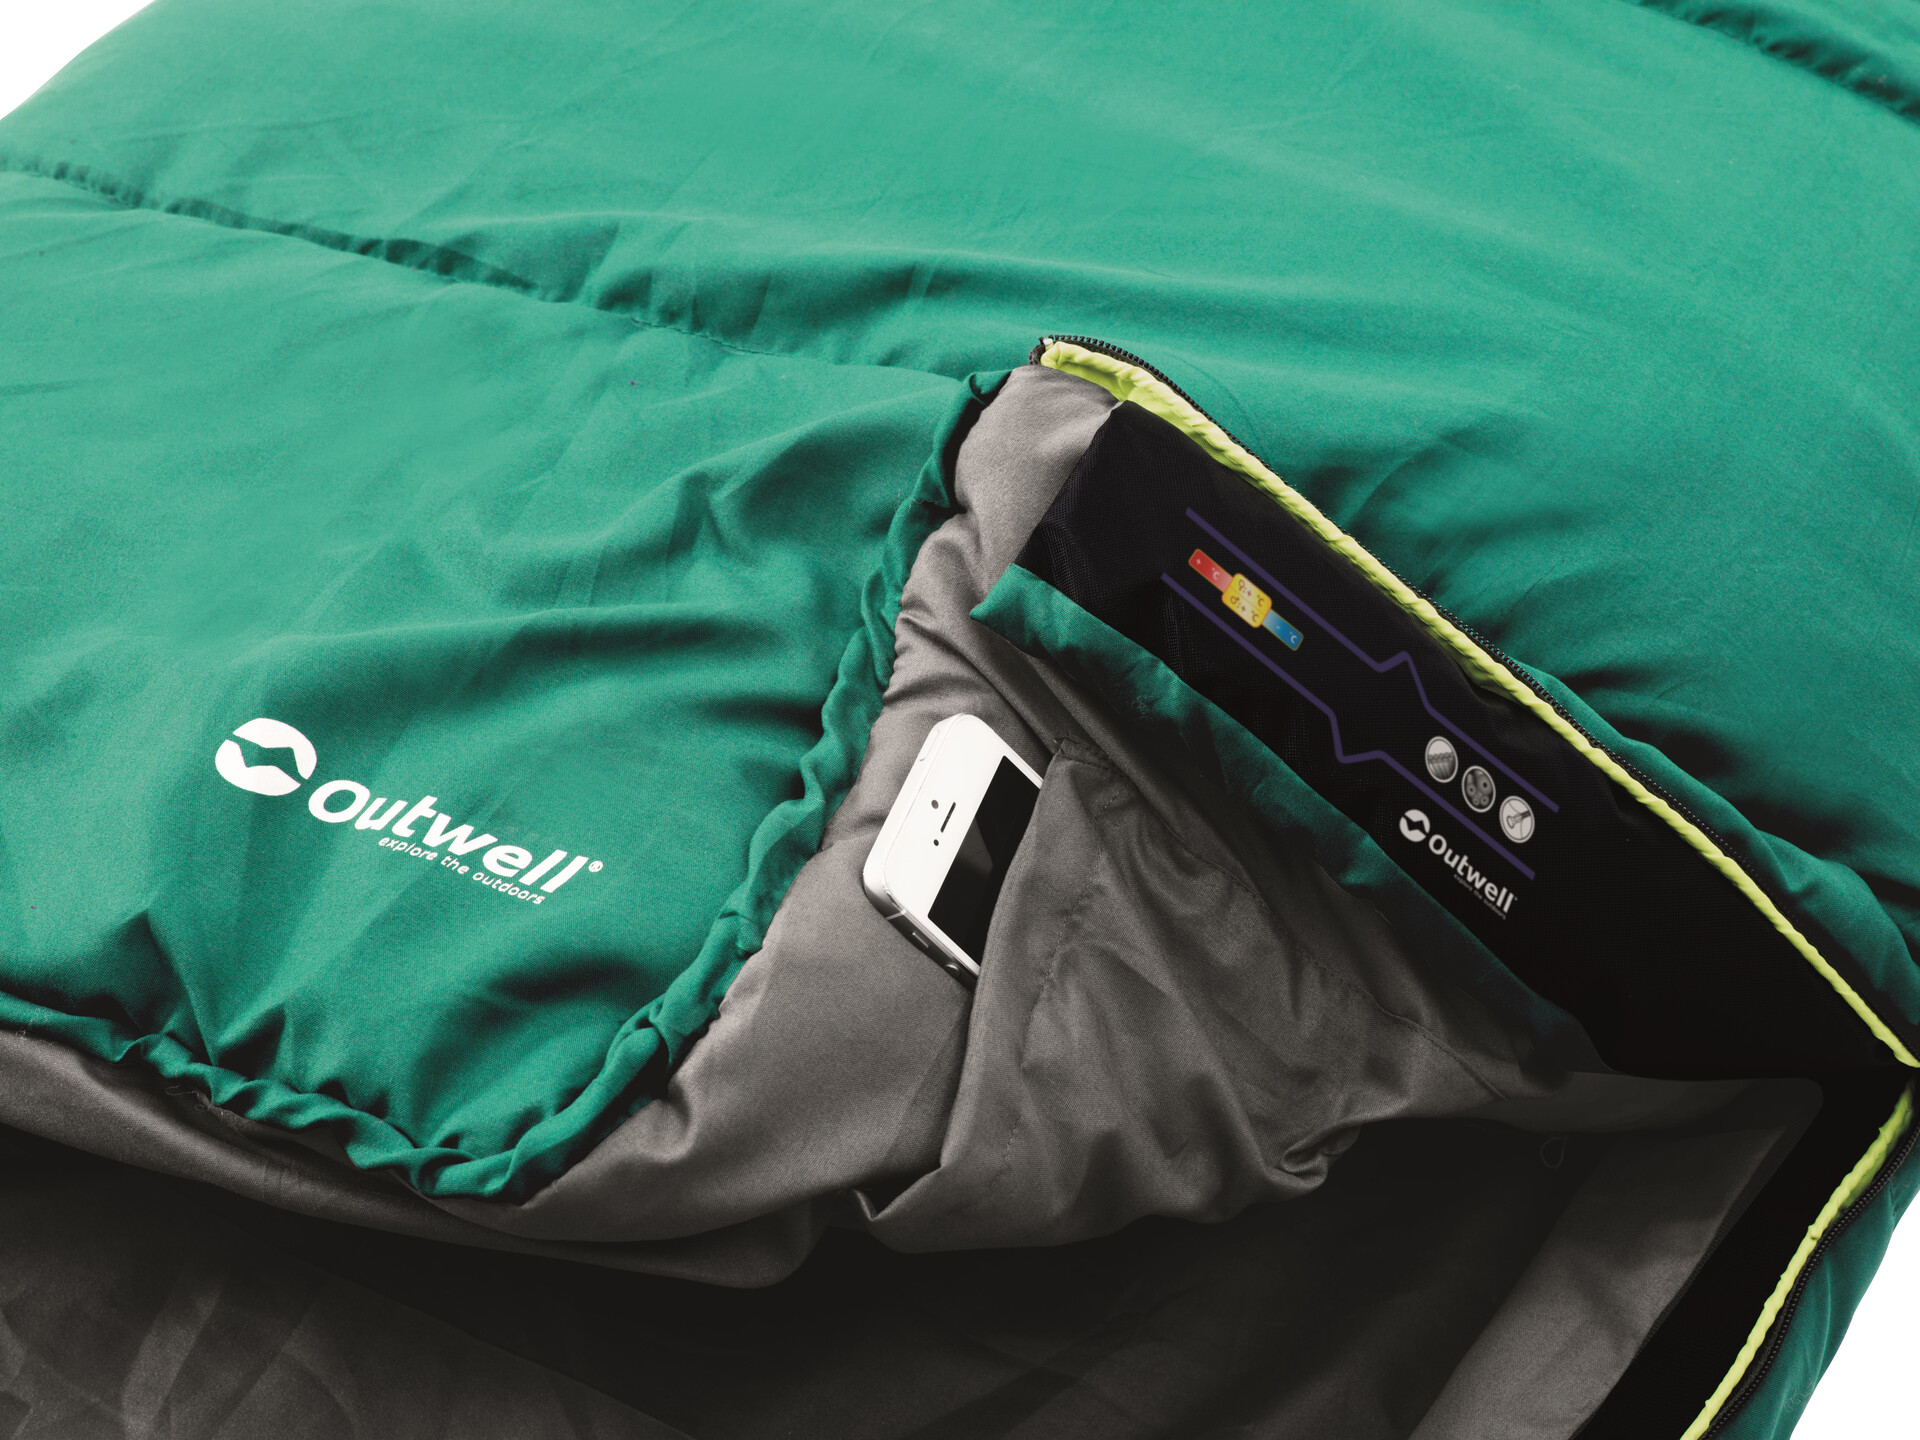 Outwell Campion saison 2 rectangulaire sac de couchage Vert